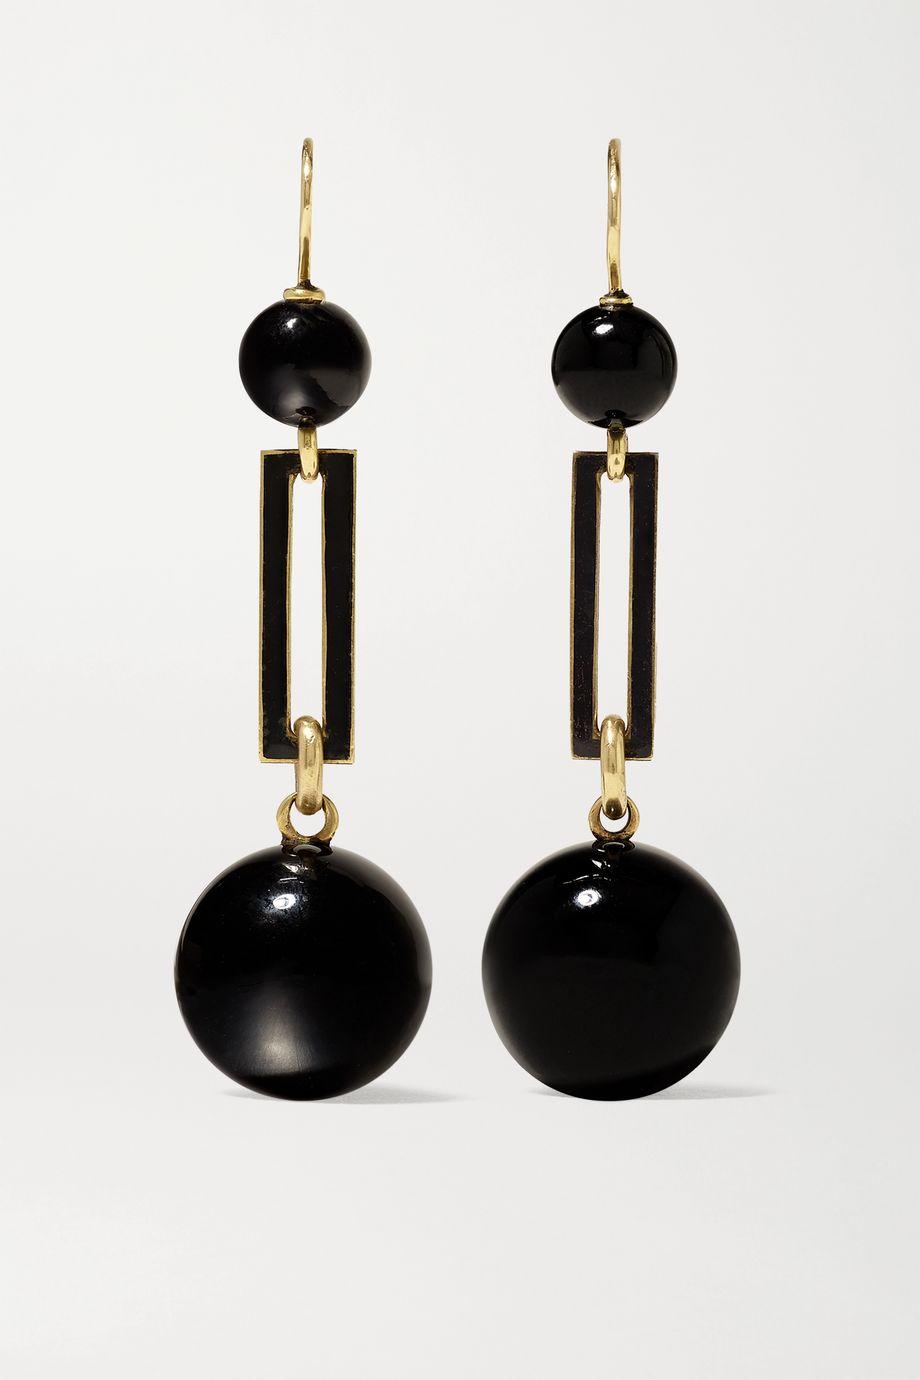 Fred Leighton 1870s 14-karat gold, enamel and onyx earrings